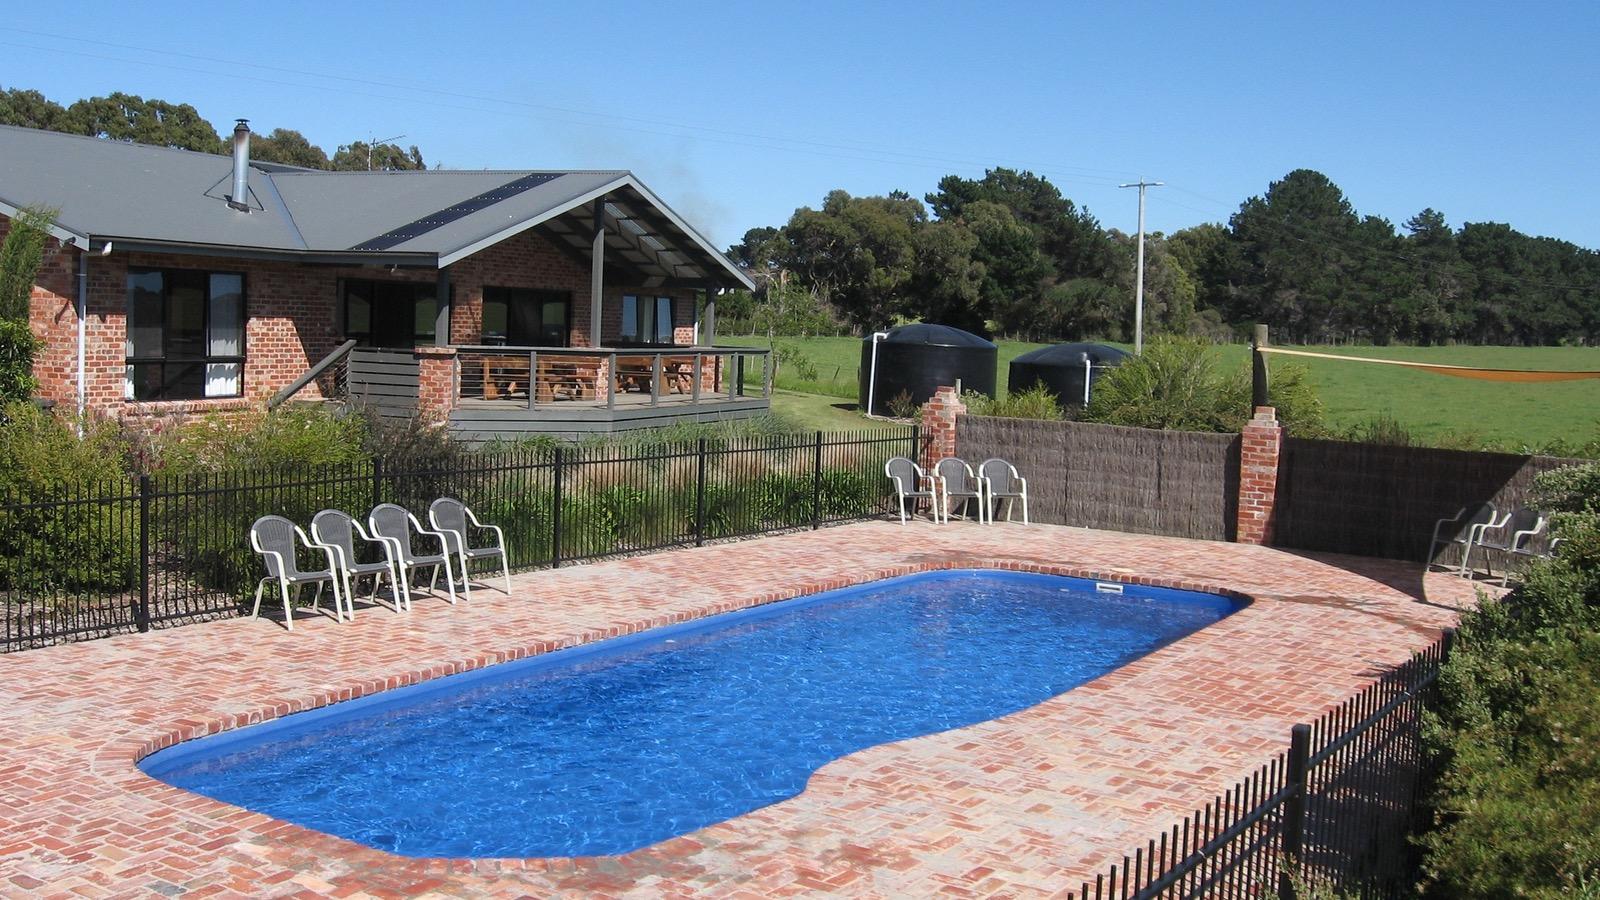 Group Lodge and pool at Prom Coast Holiday Lodge